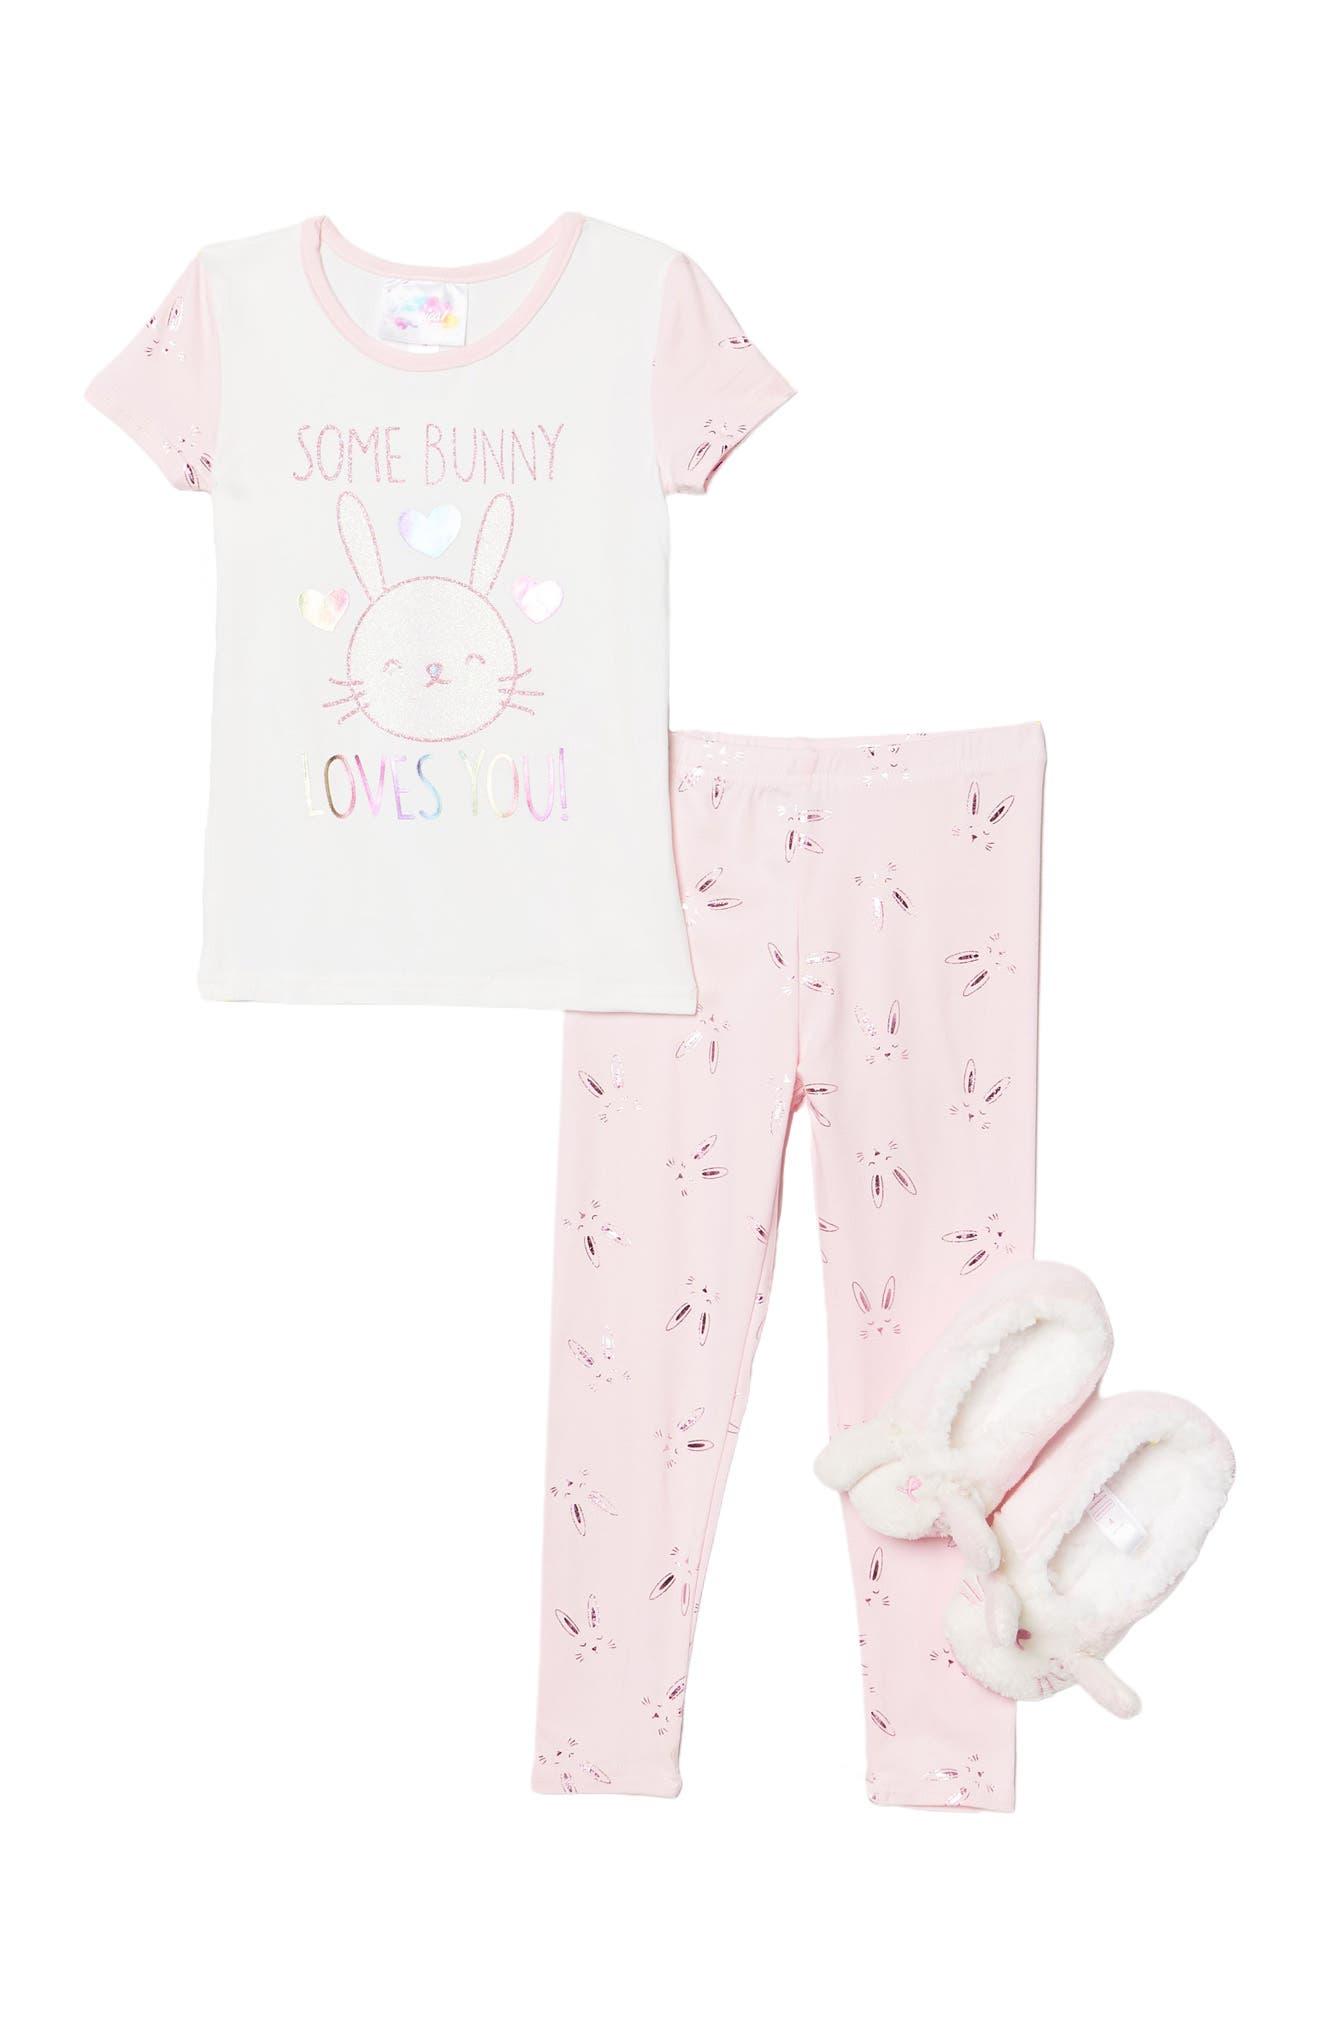 Image of Btween Somebunny Loves You Somebunny Loves You T-Shirt, Pants, & Faux Fur Slipper Set